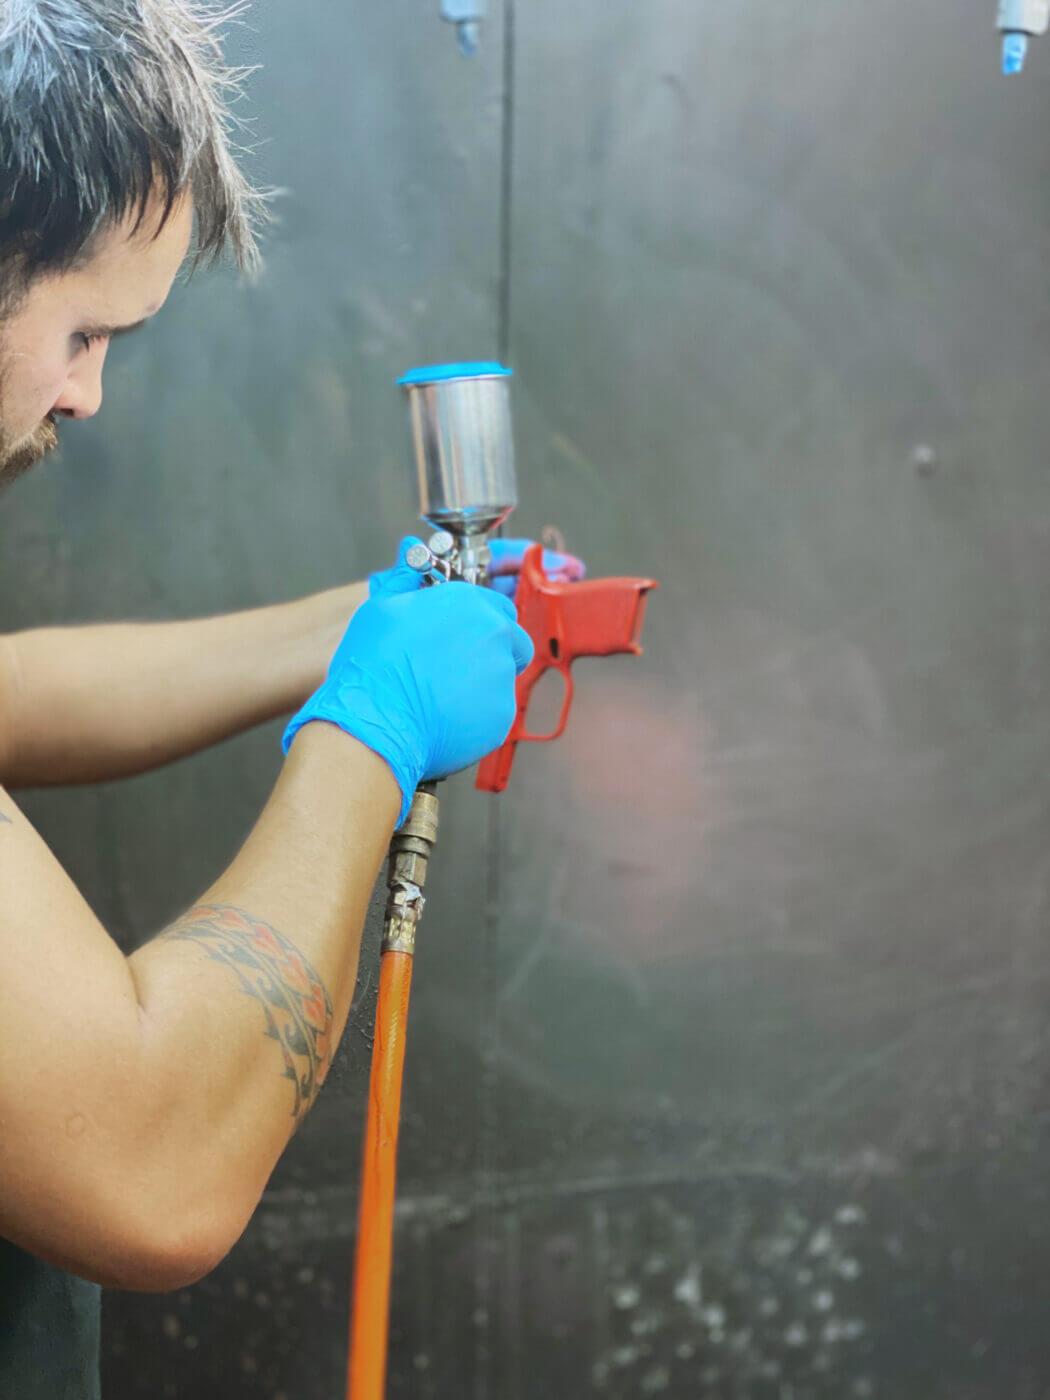 Applying a custom Cerakote finish to a pistol